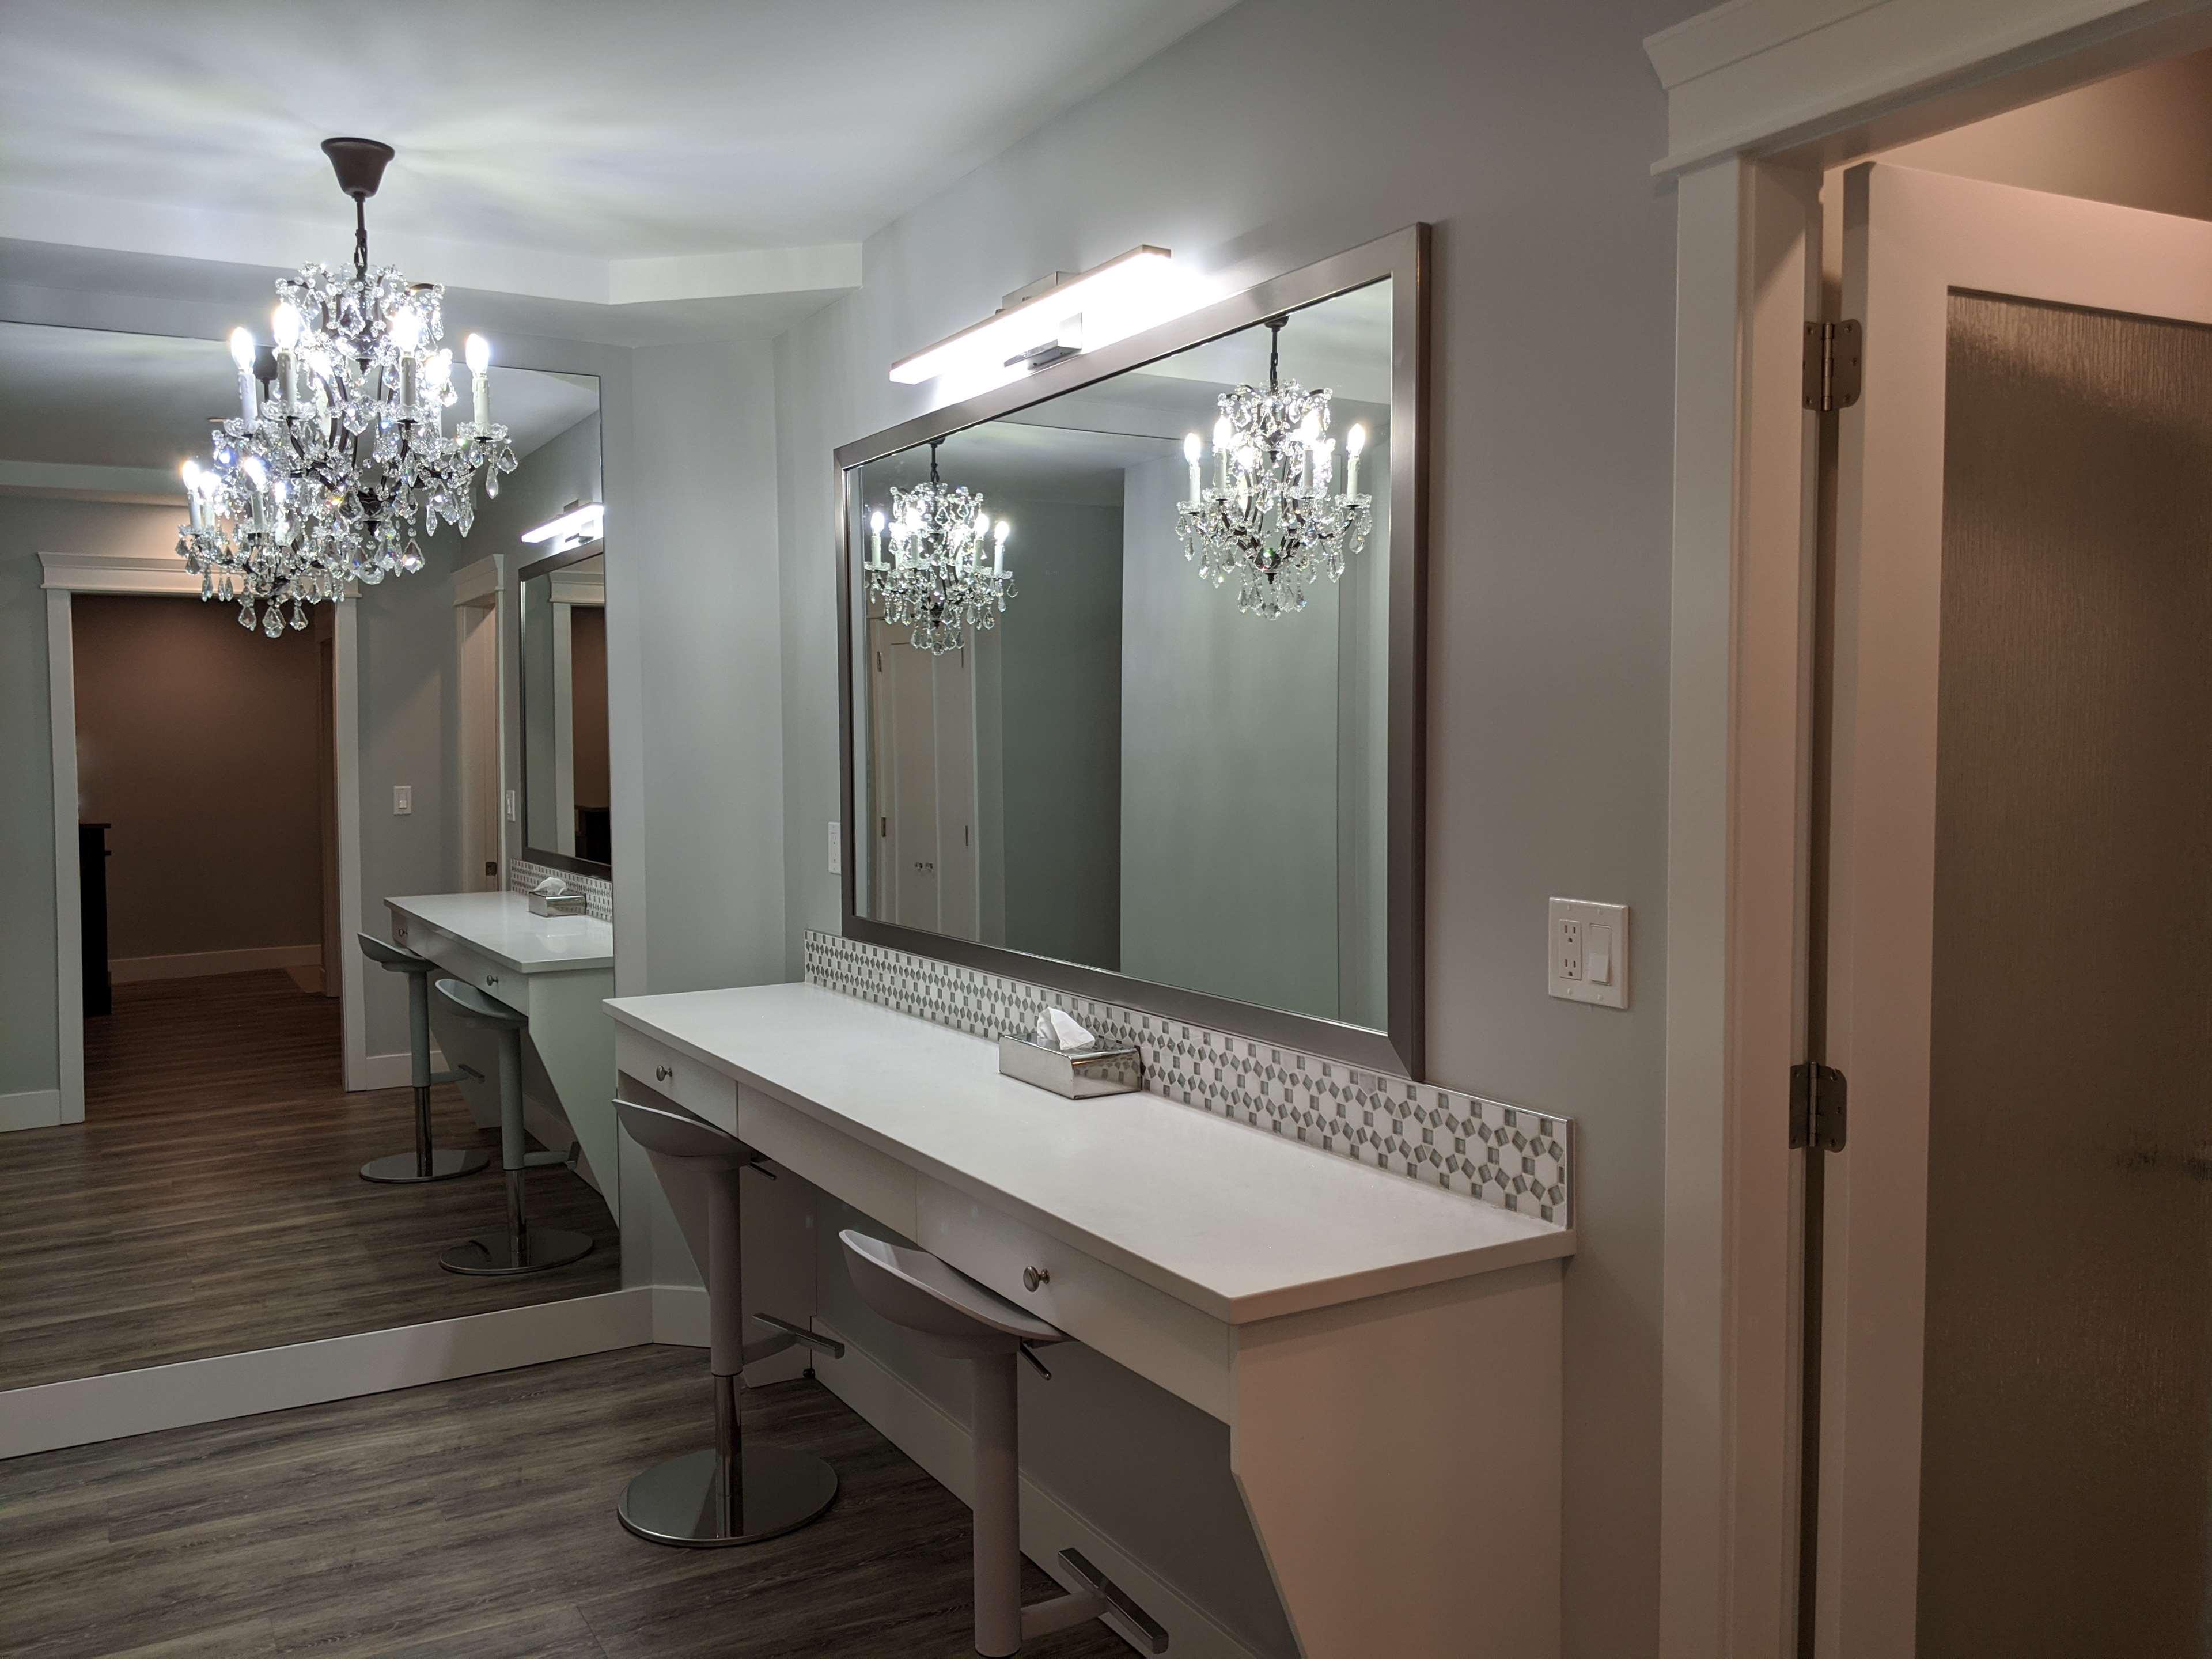 Surestay Hotel By Best Western Chilliwack in Chilliwack: King Suite Vanity Area